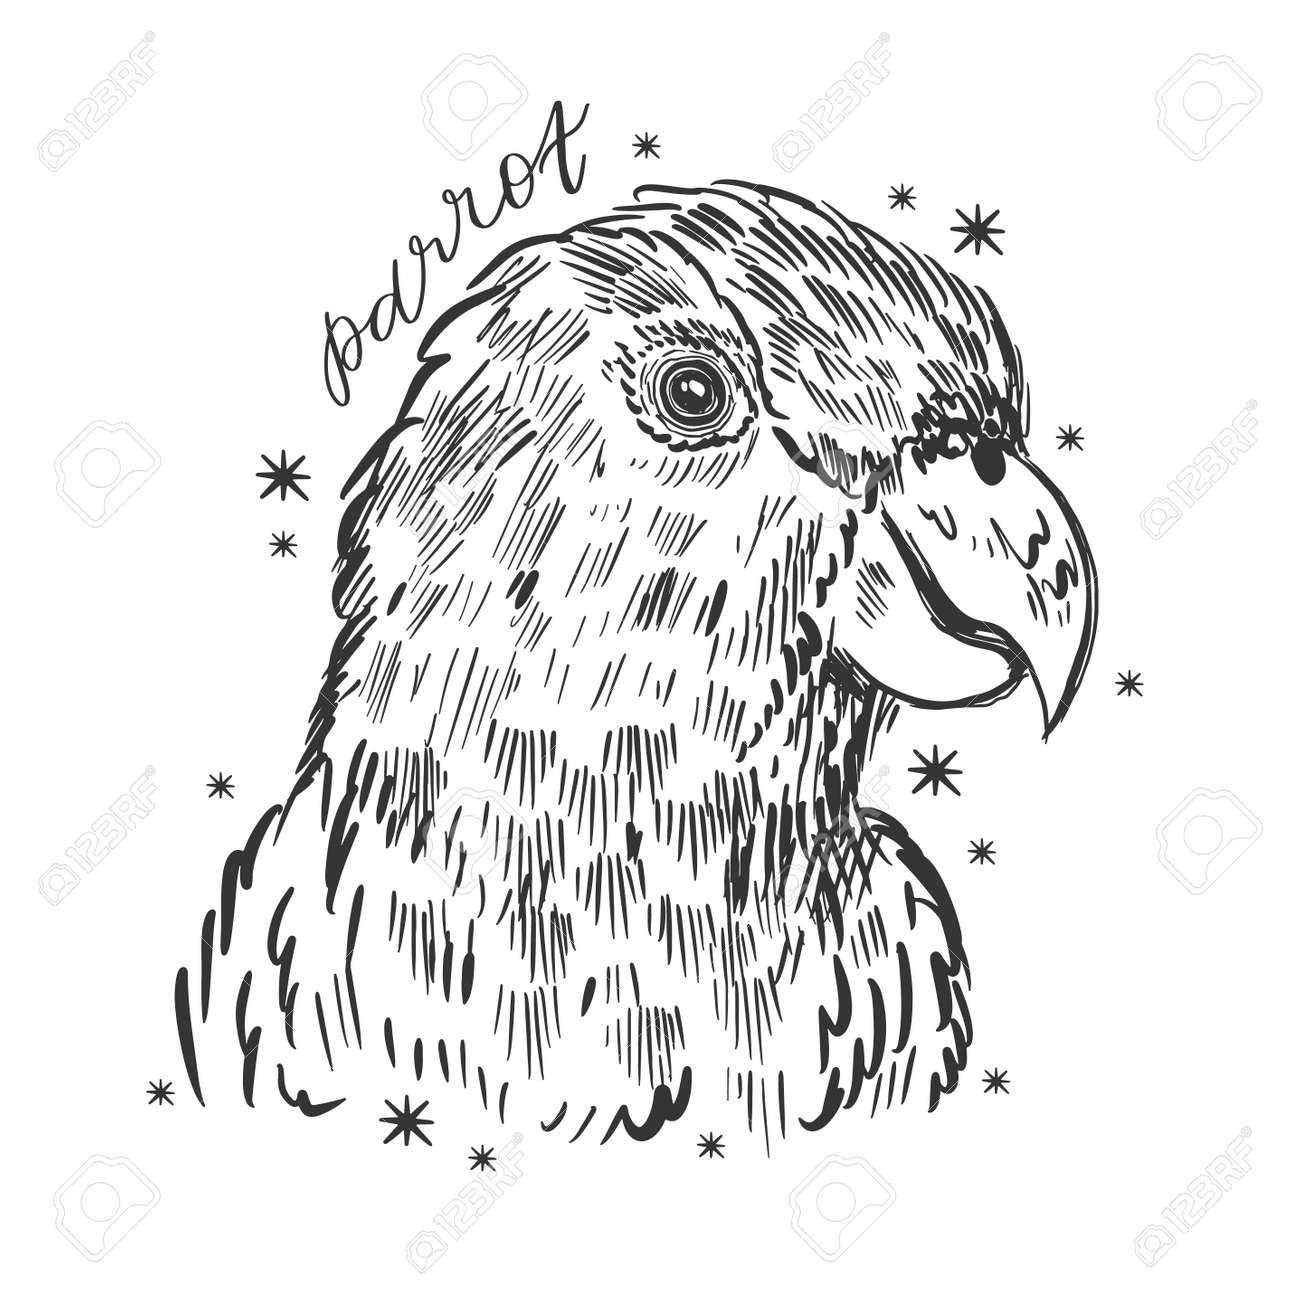 Parrot bird hand drawn sketch. Cute tropical design. - 156672270